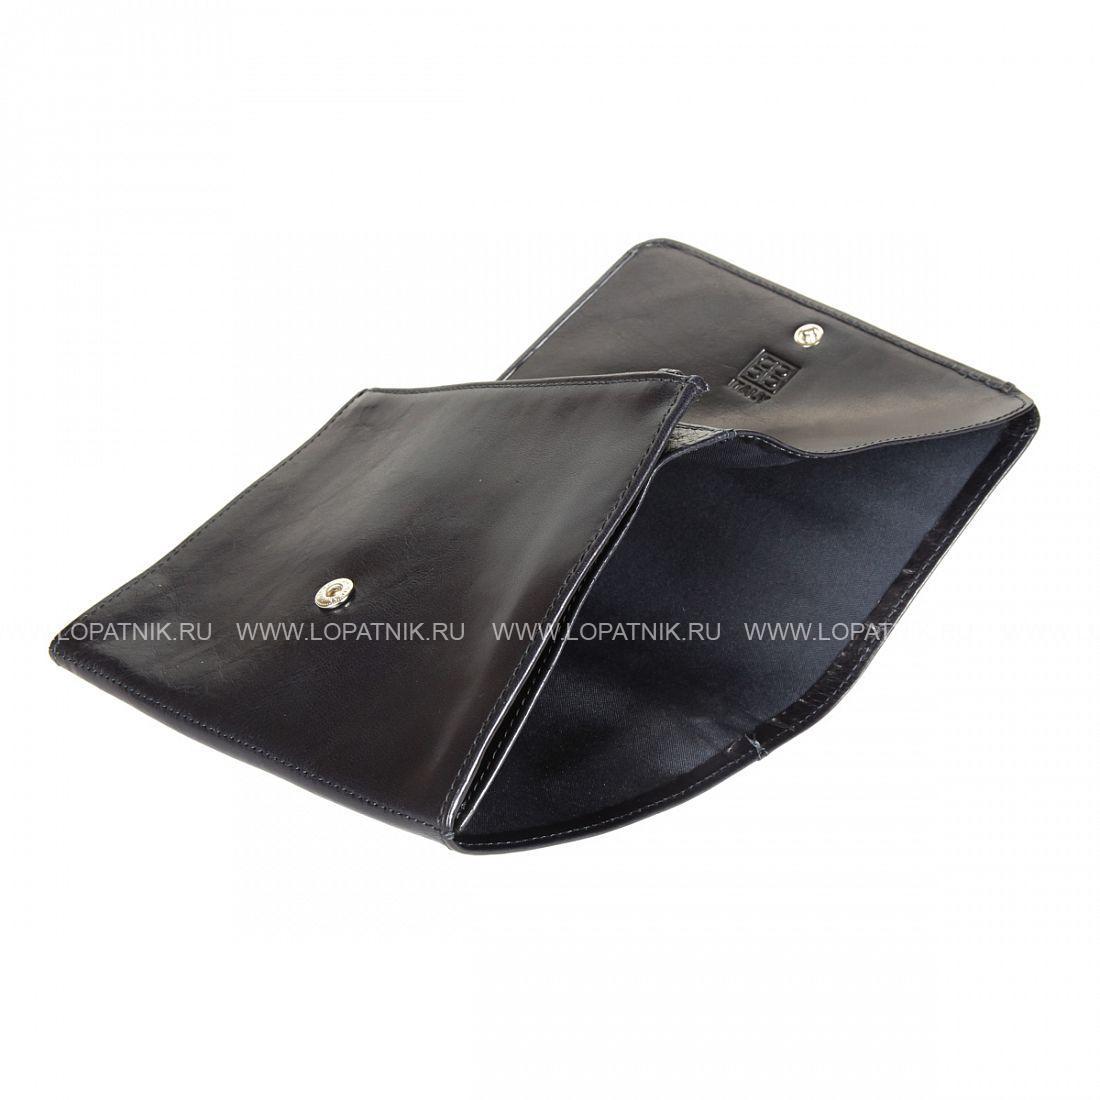 a5dc568e427a Женское кожаное портмоне Sergio Belotti 3510 IRIDO navy, Синий цена ...